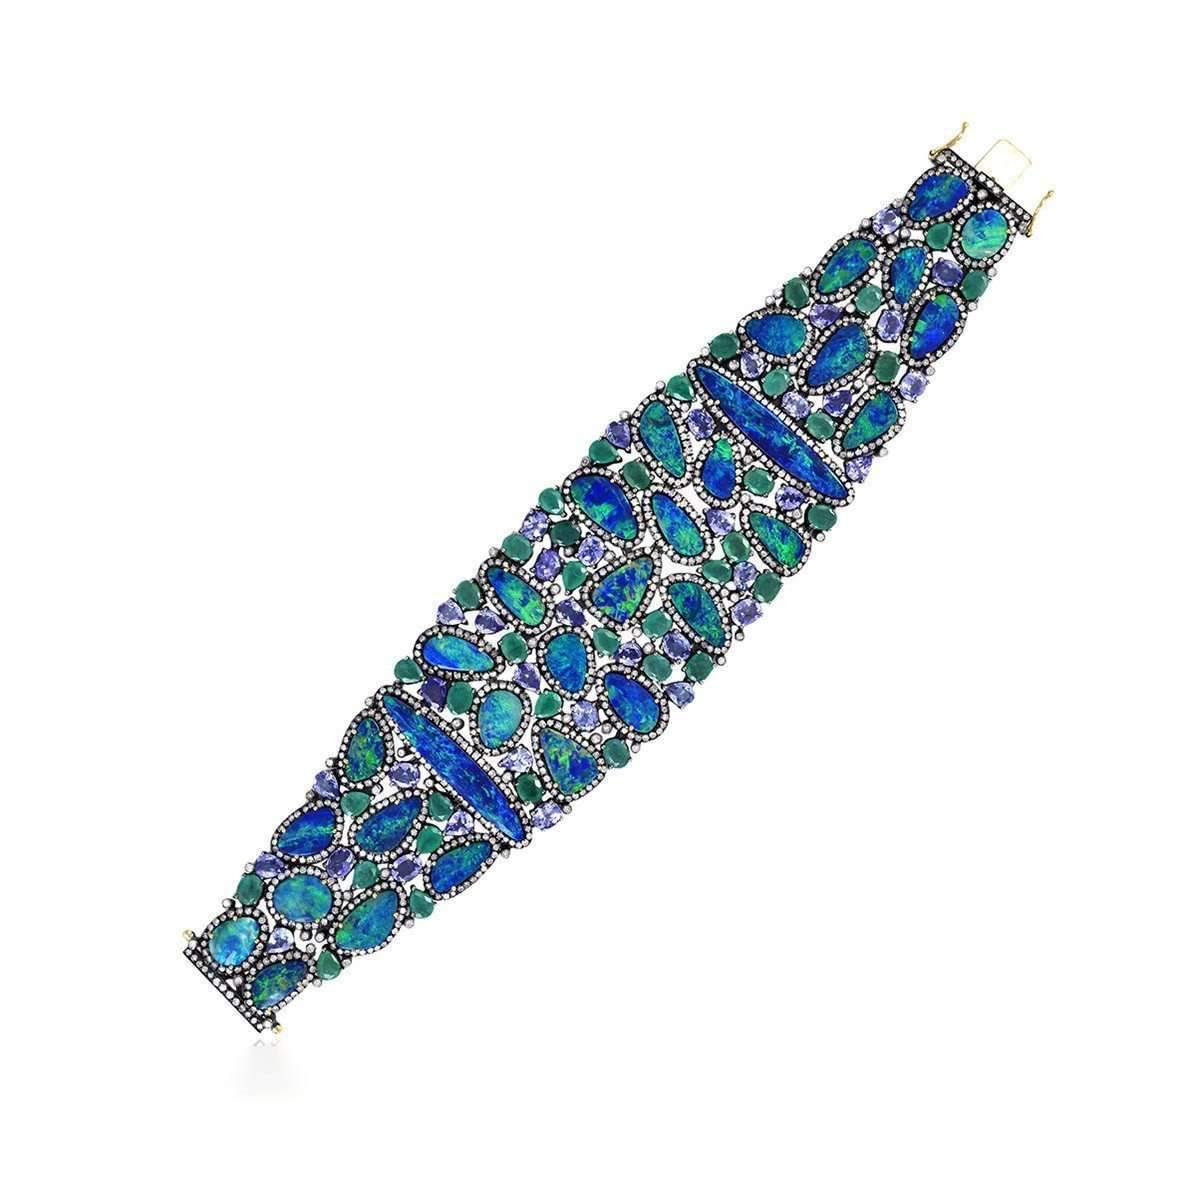 Socheec Designer Opal Diamond Bracelet a1n5znm